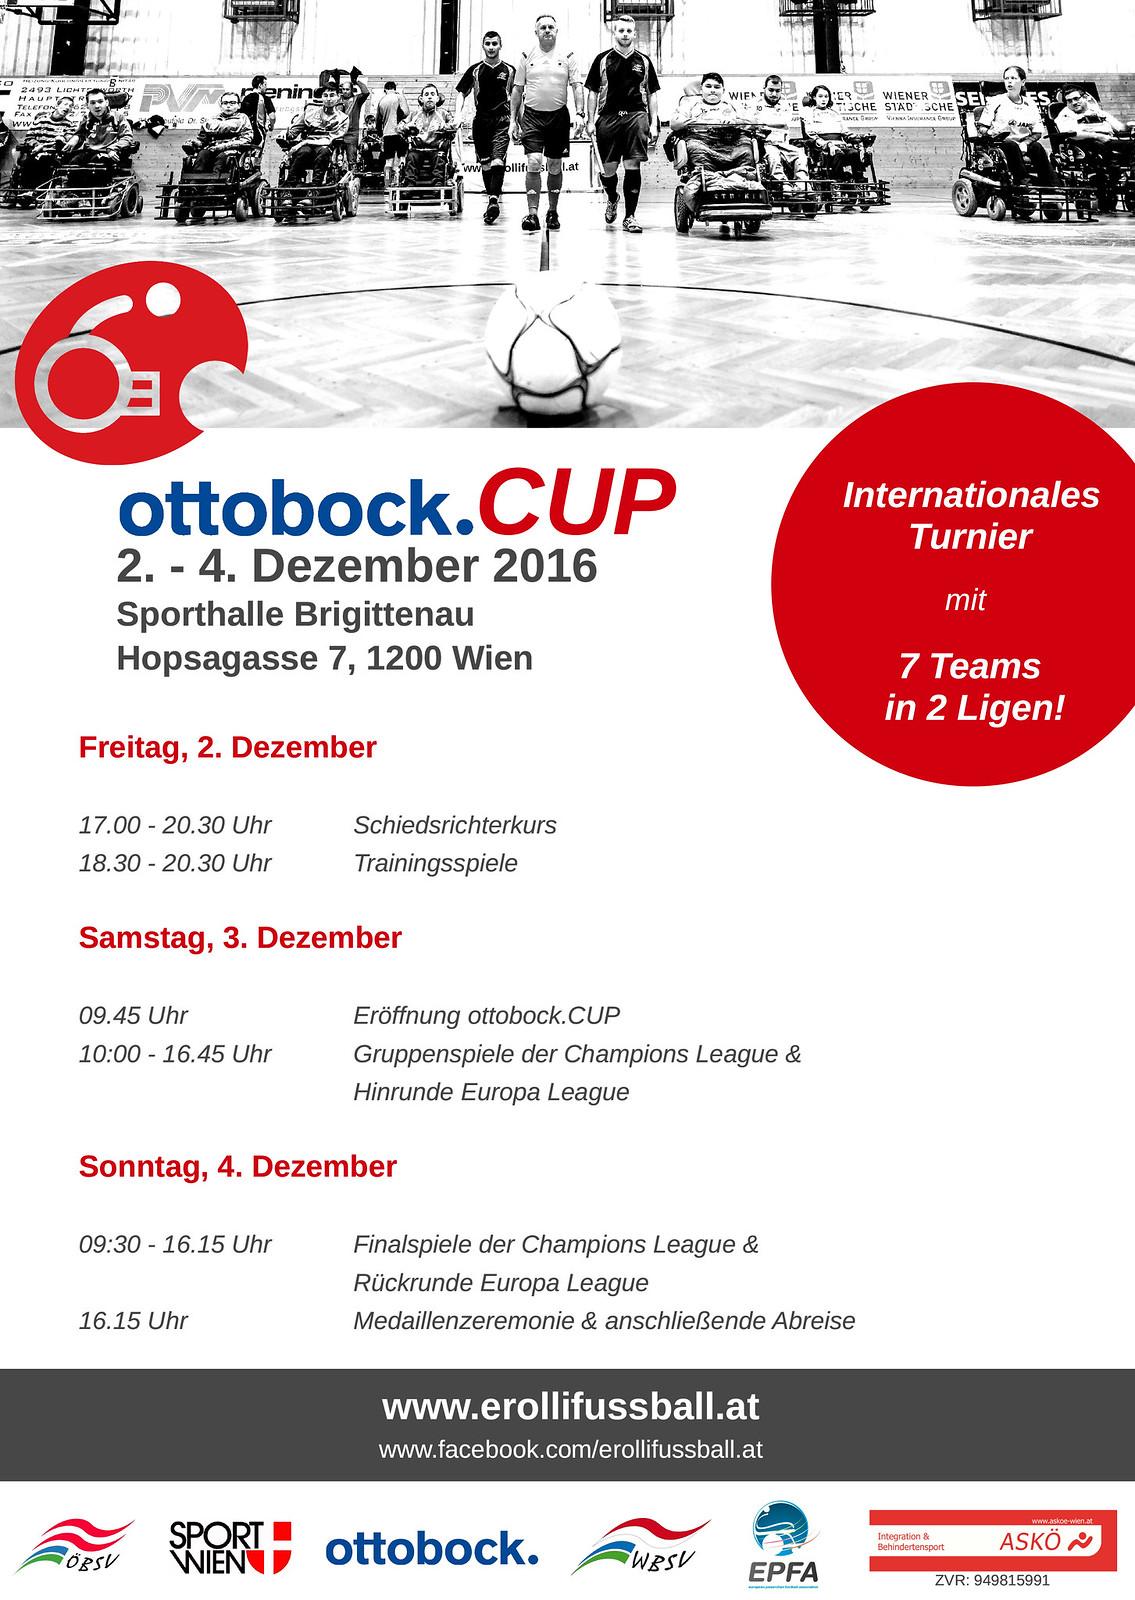 Plakat ottobockcup2016